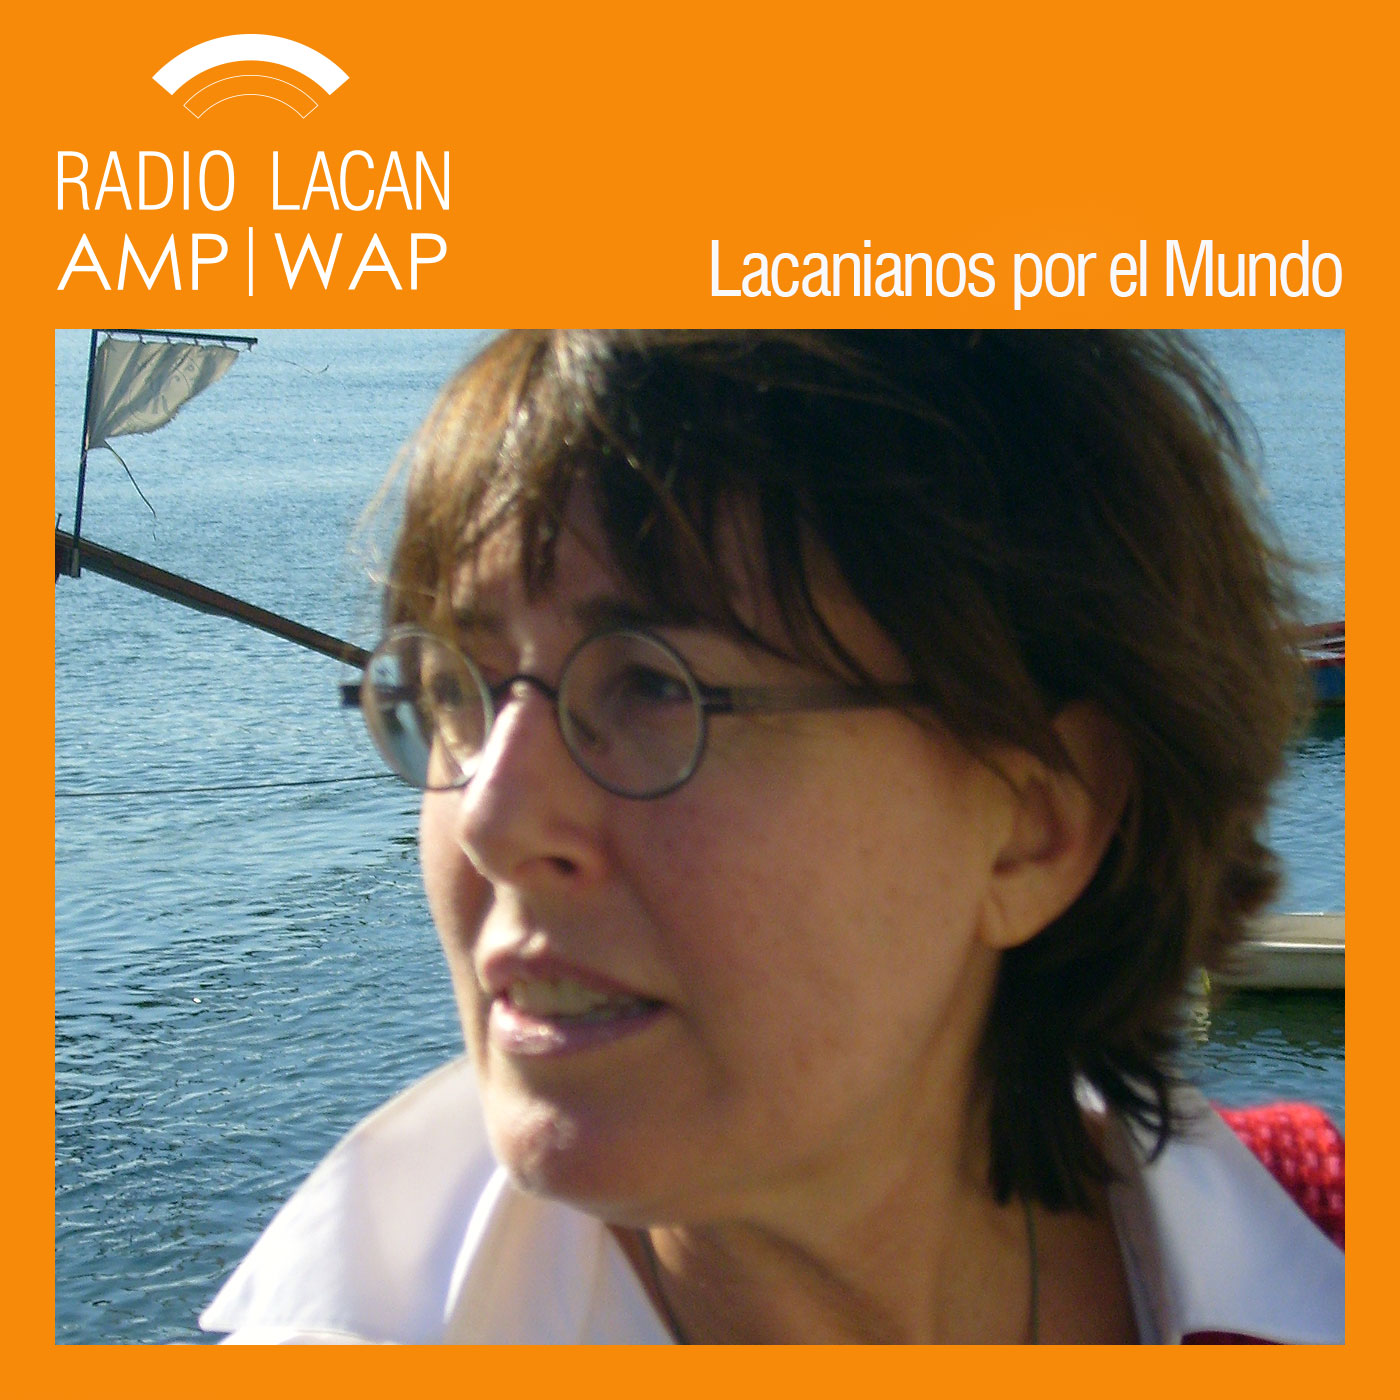 RadioLacan.com | <![CDATA[#LacanianosxElMundo: Ginebra. Entrevista a Beatriz Premazzi]]>